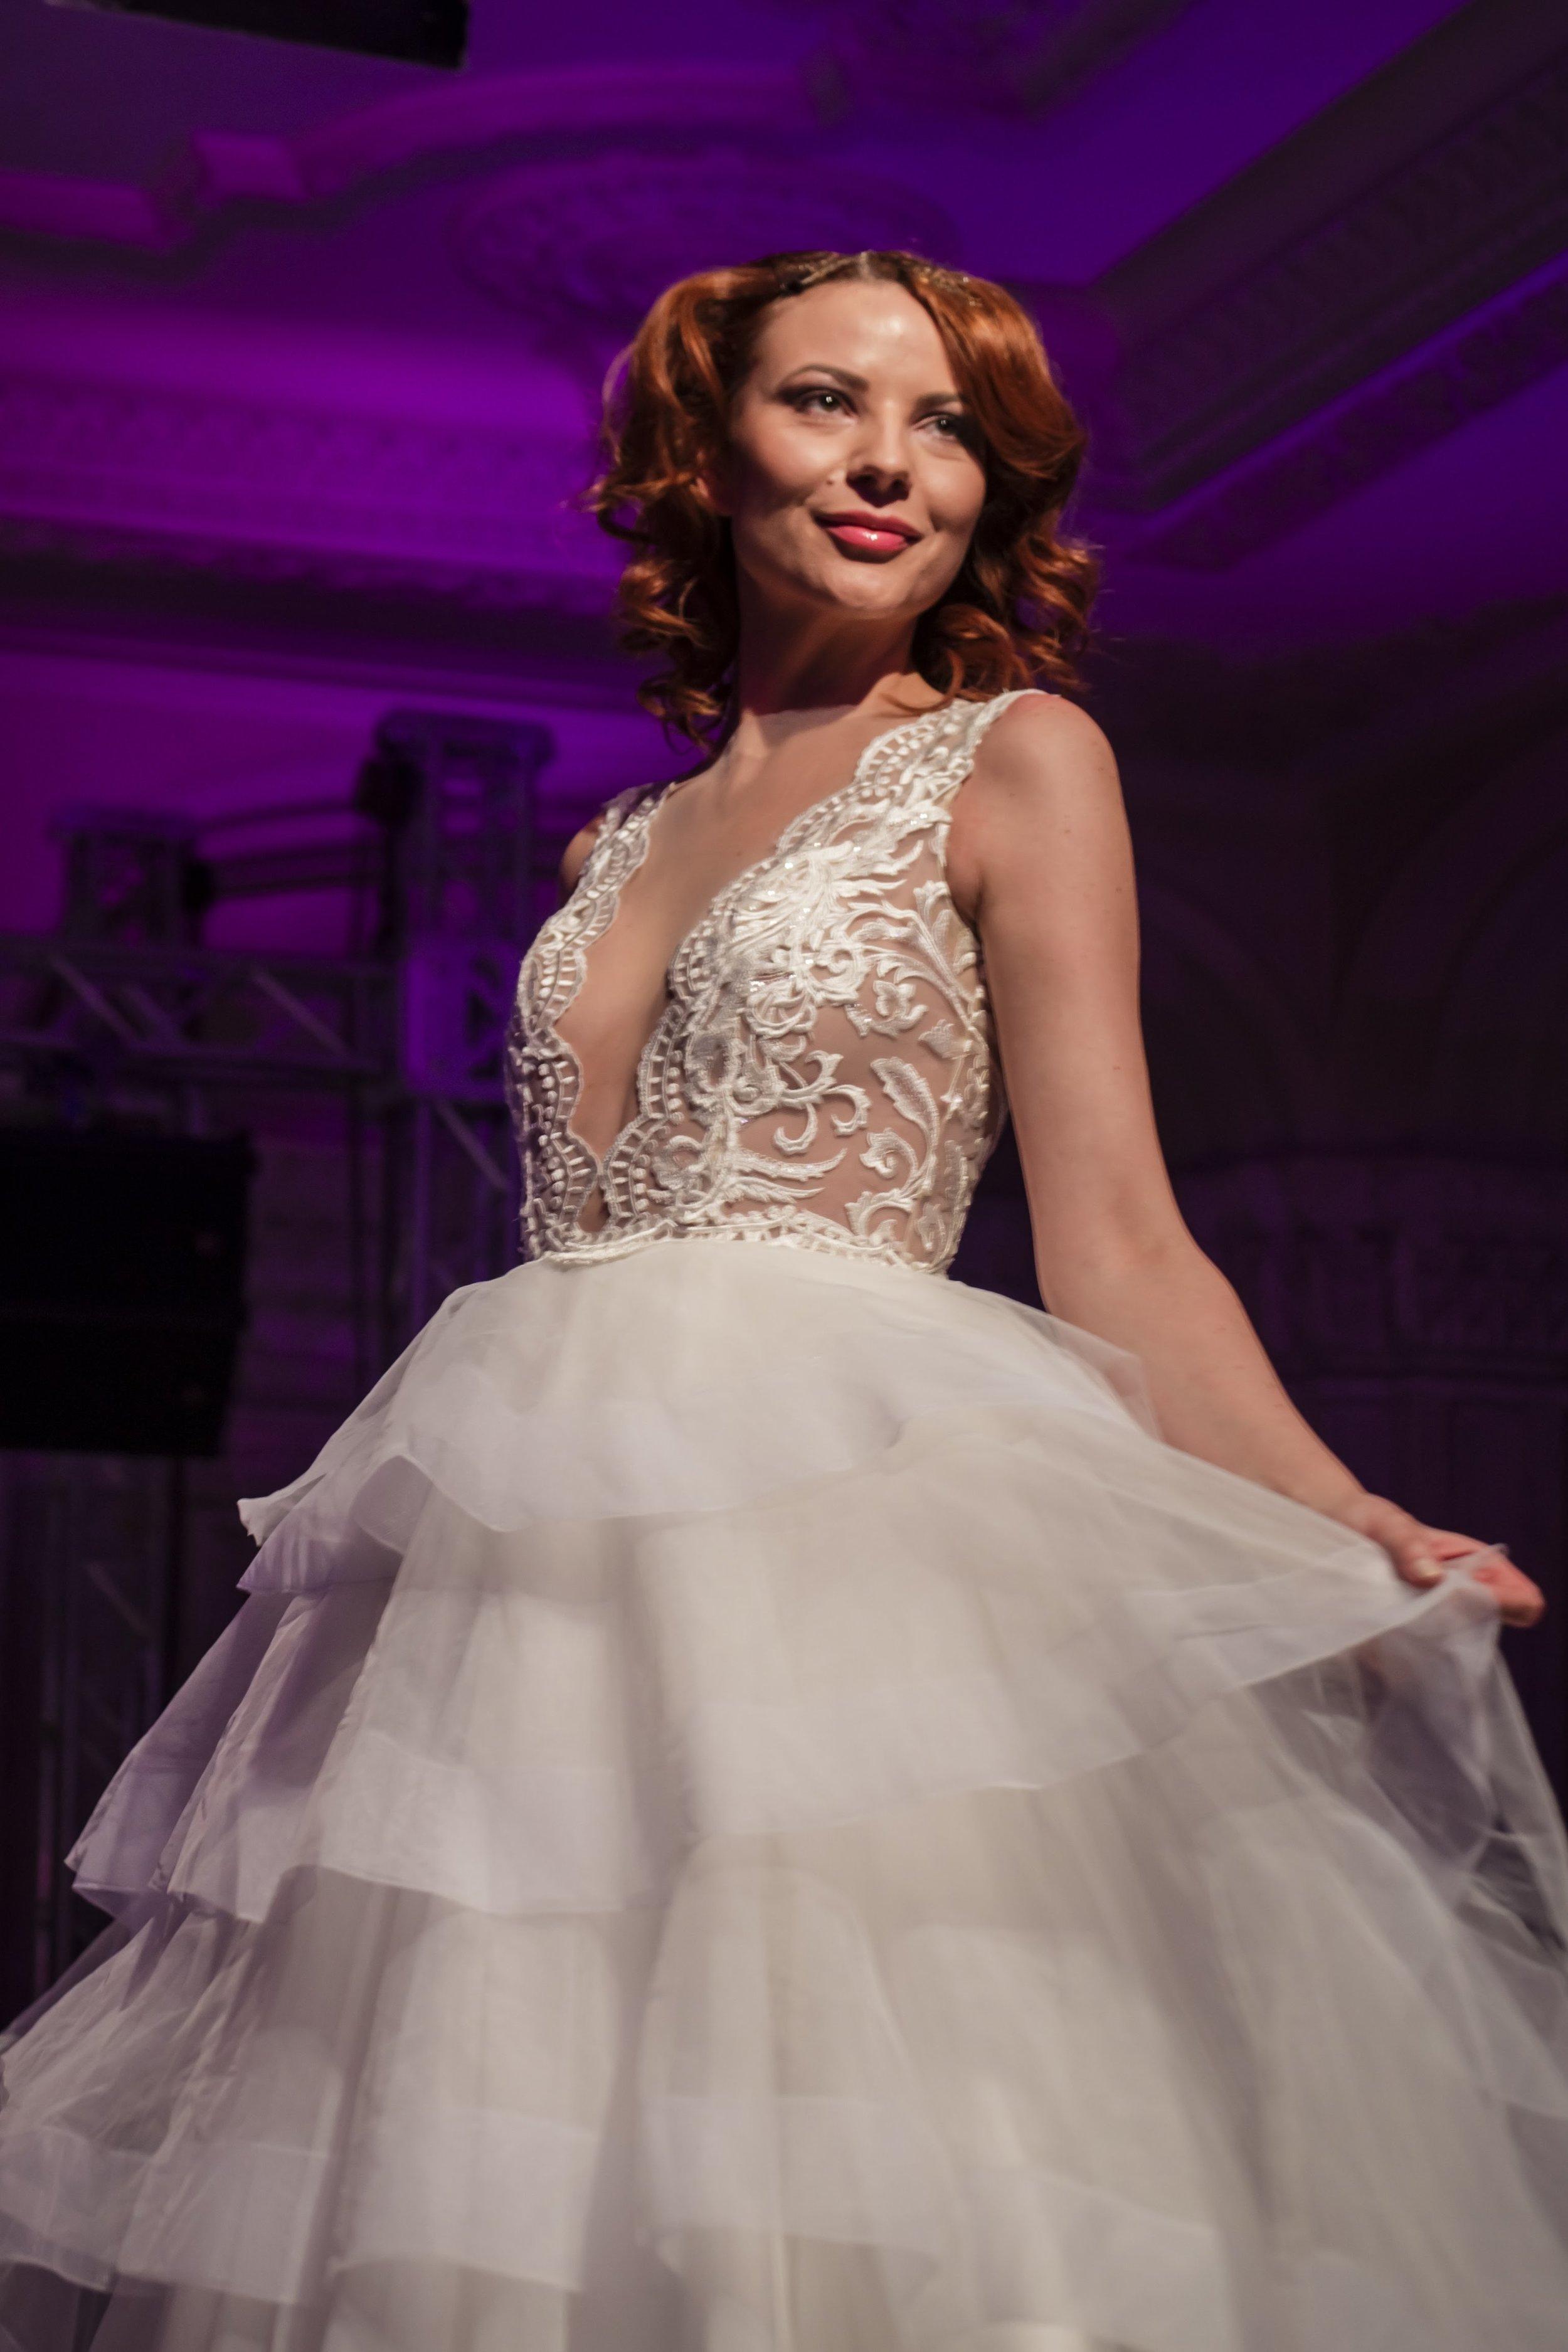 Camelia 2018 Wedding Dress - Fashion by Laina